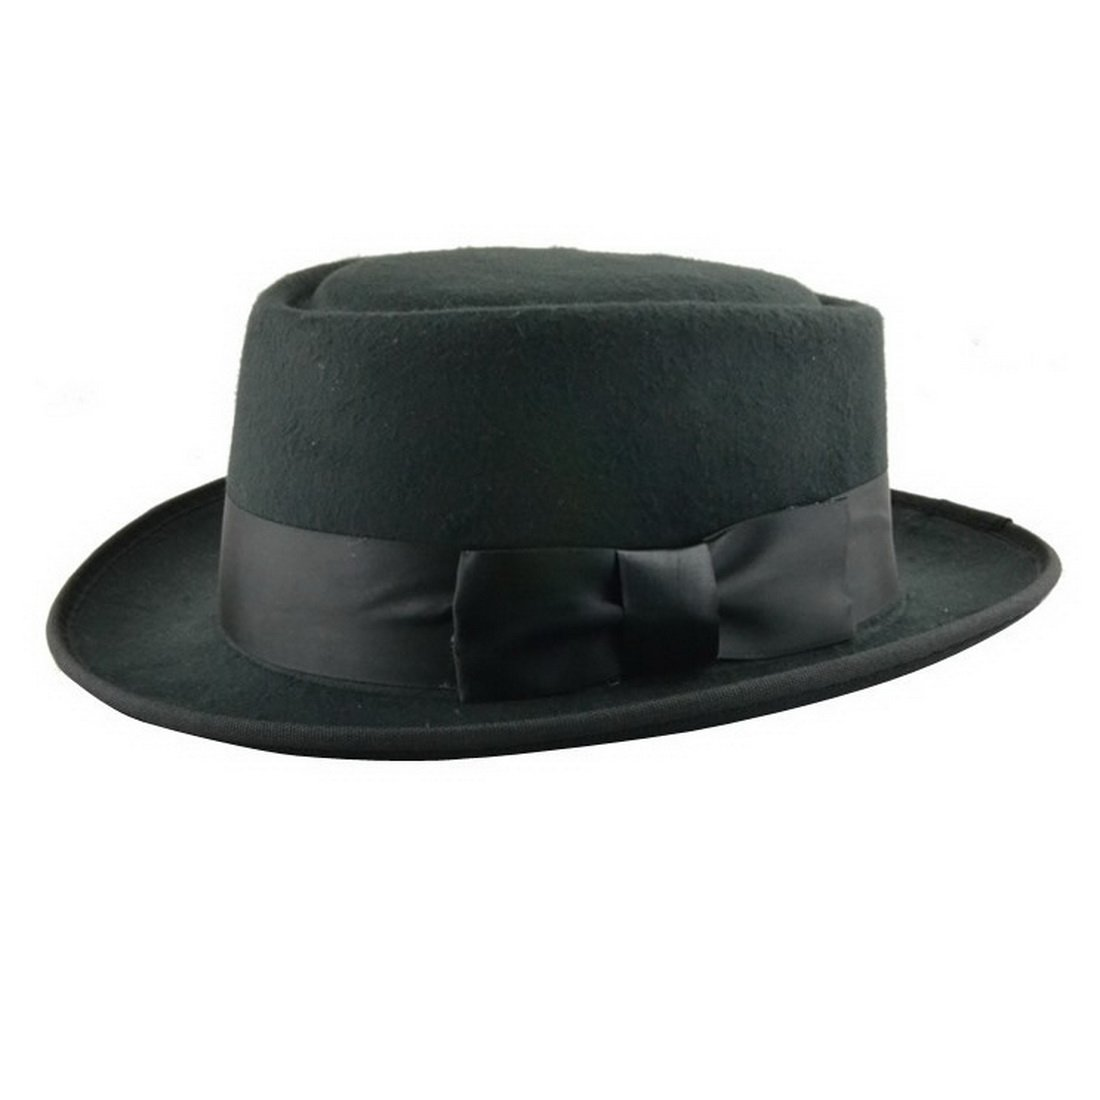 Amazon.com  Xcoser Breaking Bad Hat Walter White Cosplay Heisenberg Hat  Pork Pie Cap in Black  Toys   Games 5b31fdd7023